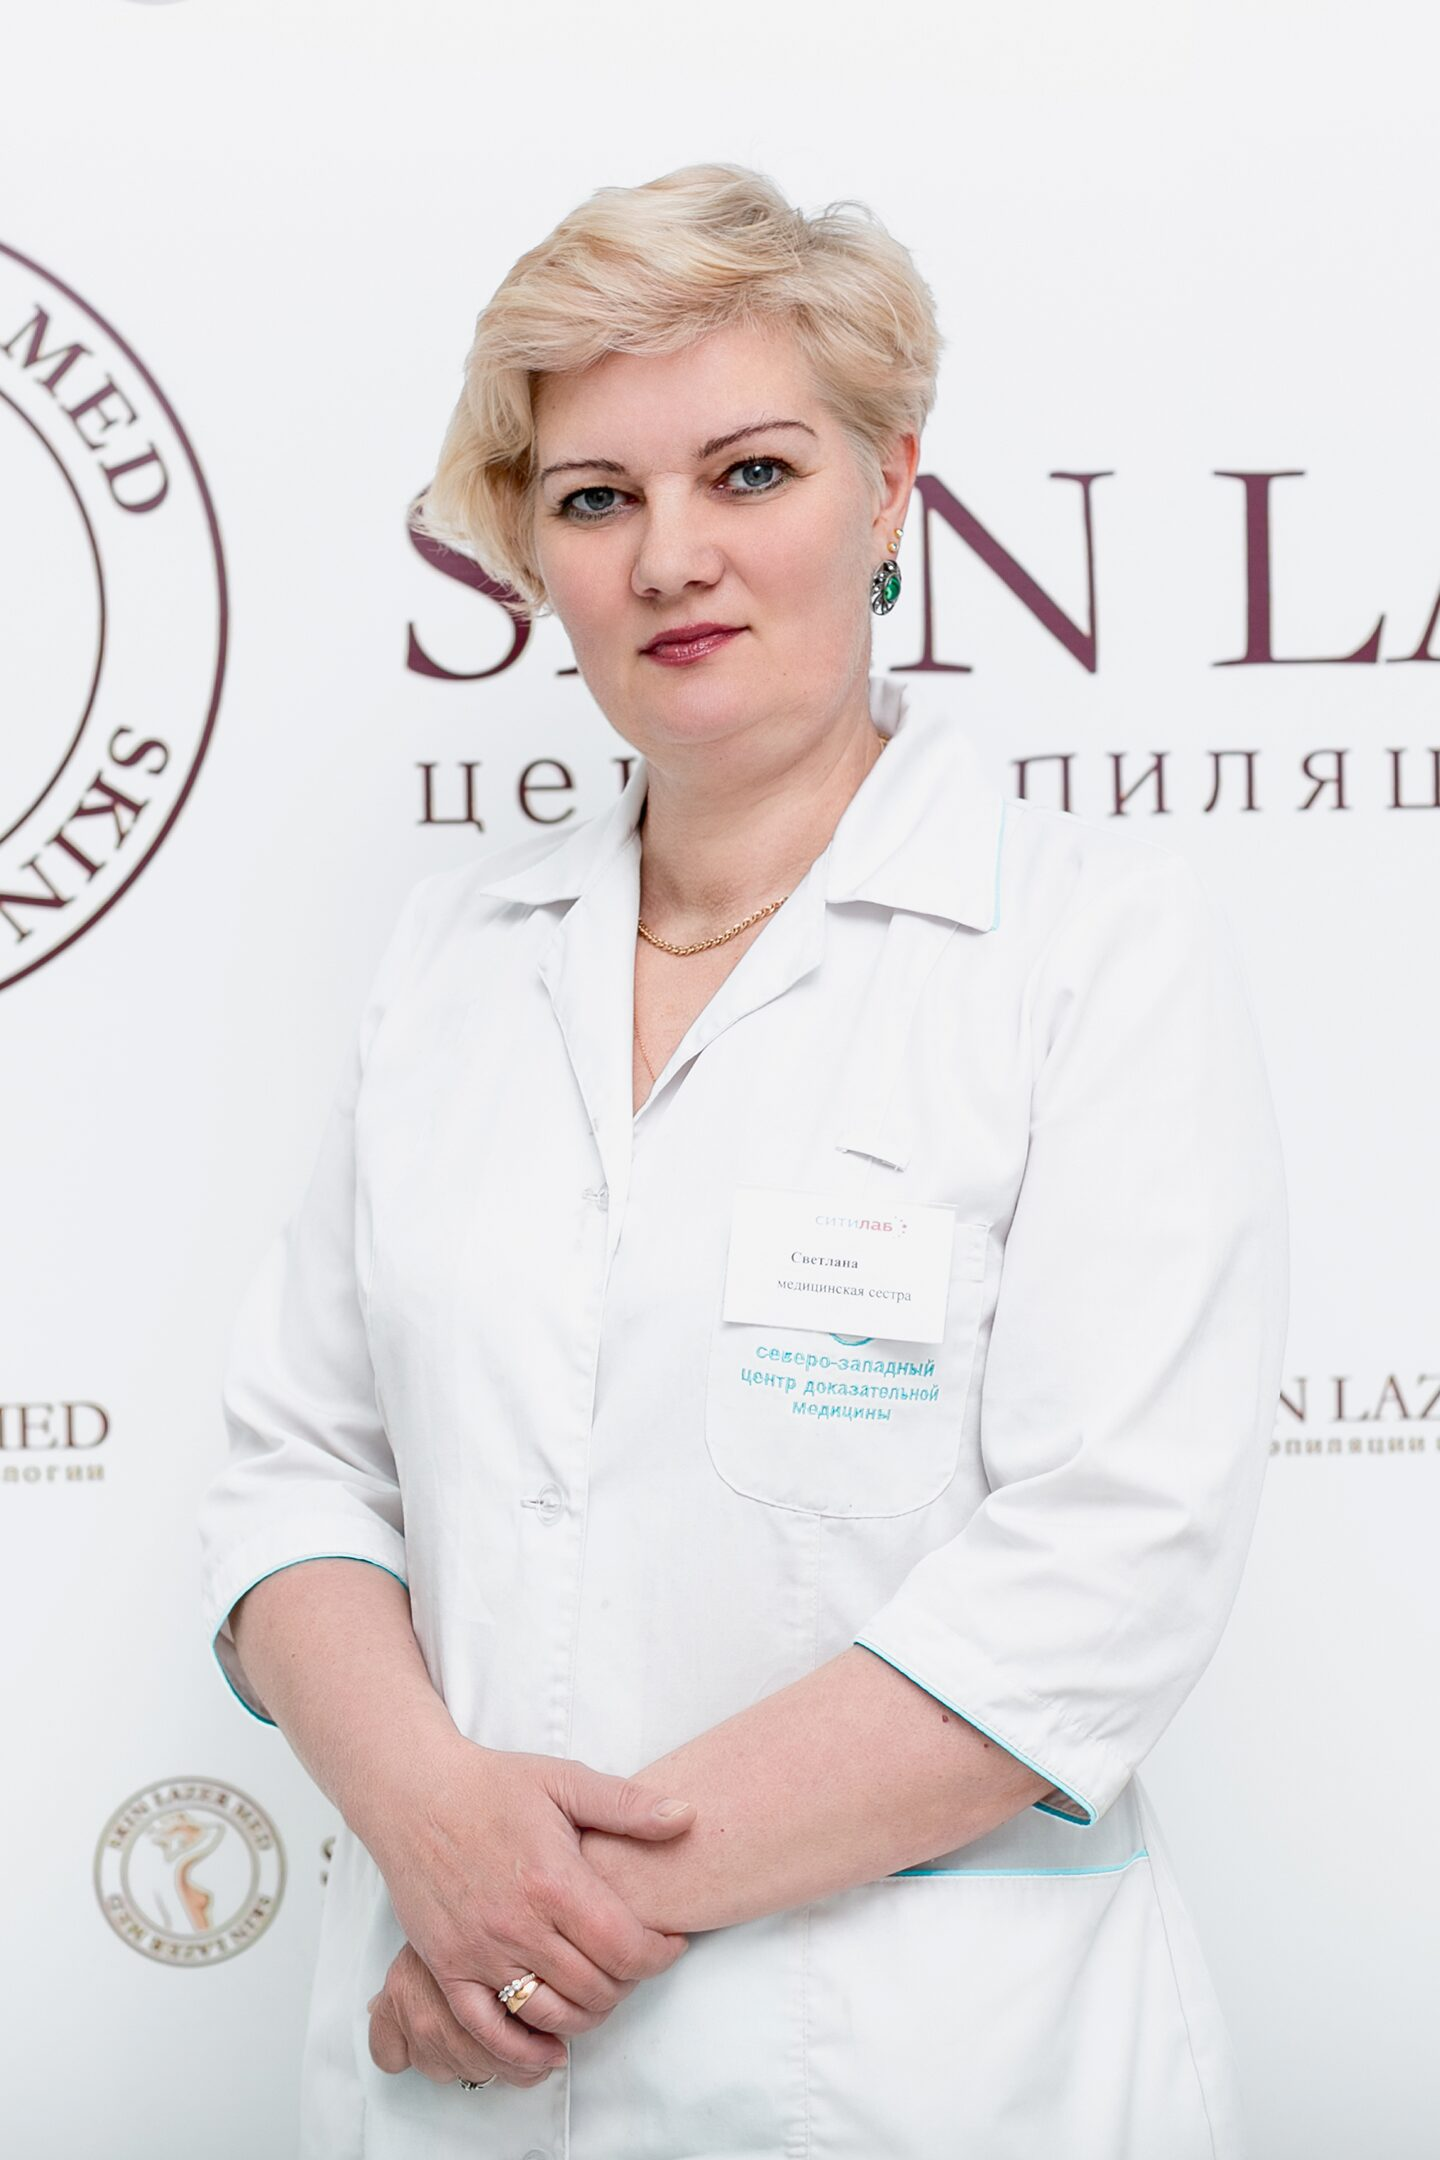 Блохина Светлана Владимировна, медсестра